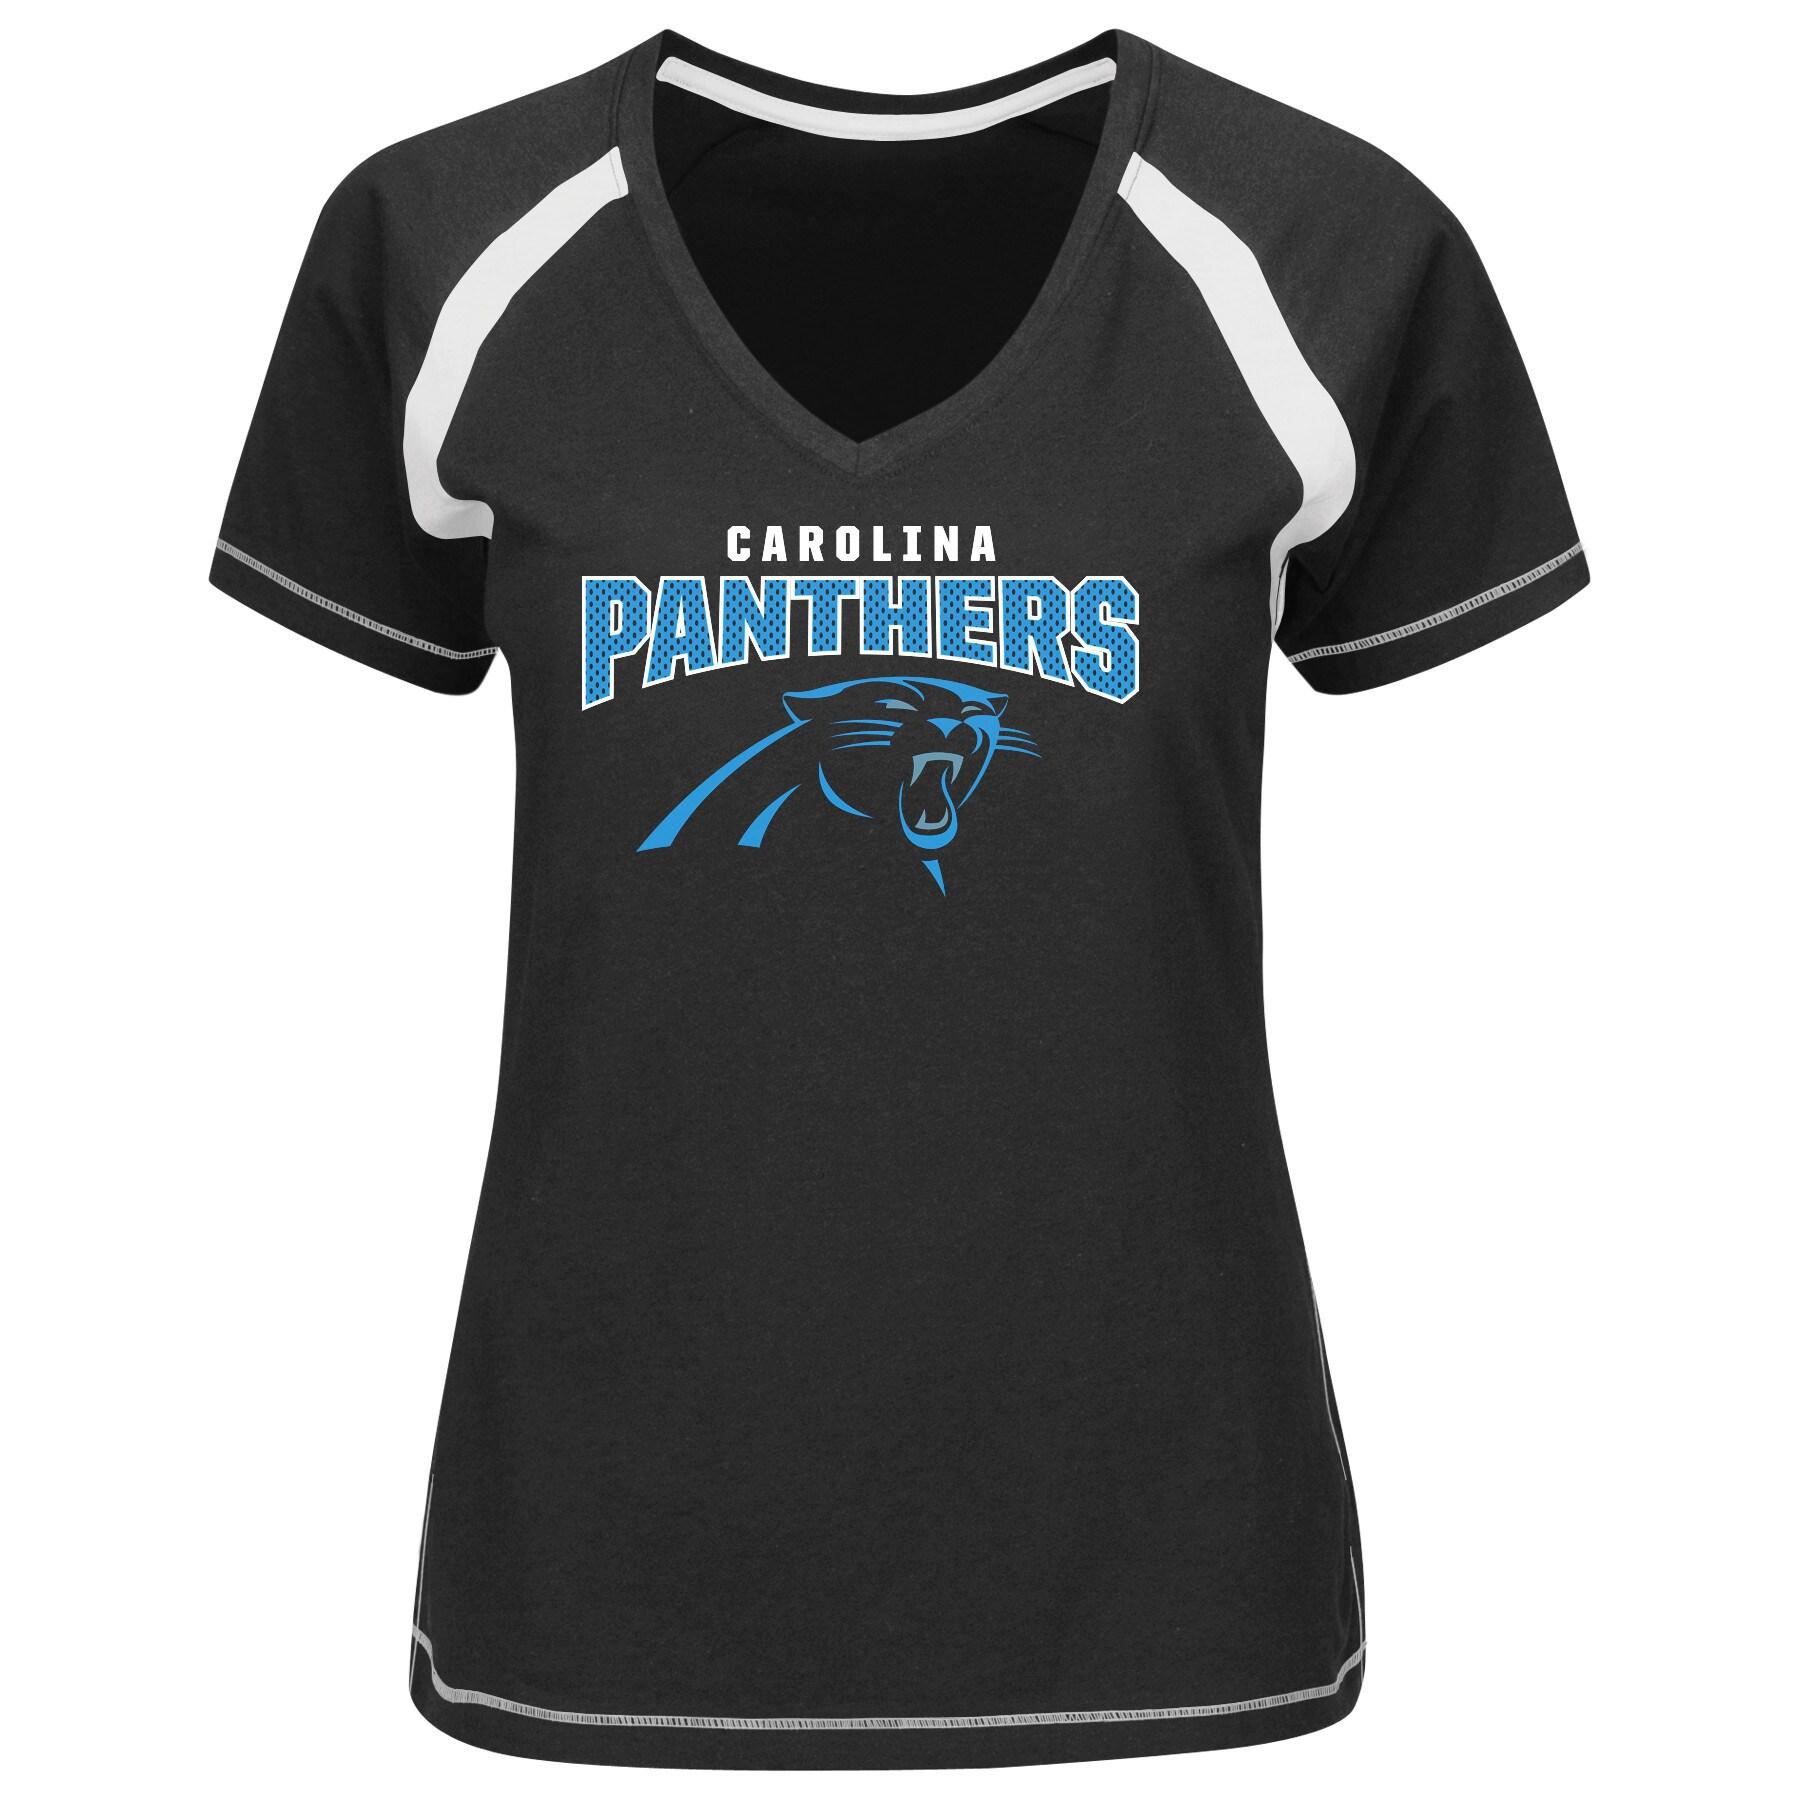 Carolina Panthers Majestic Women's Game Day Tradition V-Neck T-Shirt - Black